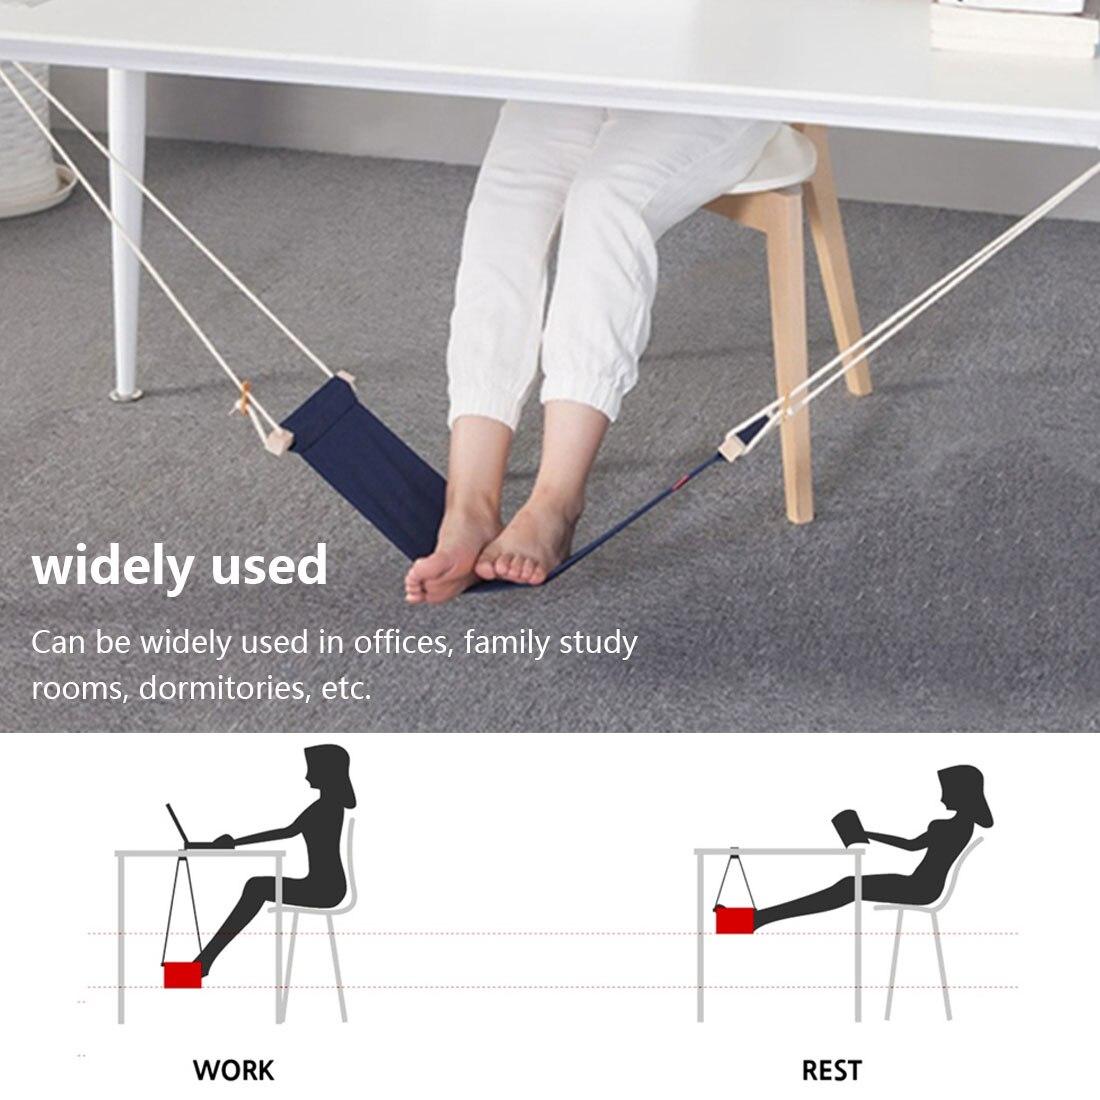 Portable Desk Feet Hammock Foot Chair Care Under Desk Hammock Outdoor Rest Cot Office Foot Hammock Mini Feet Office Rest